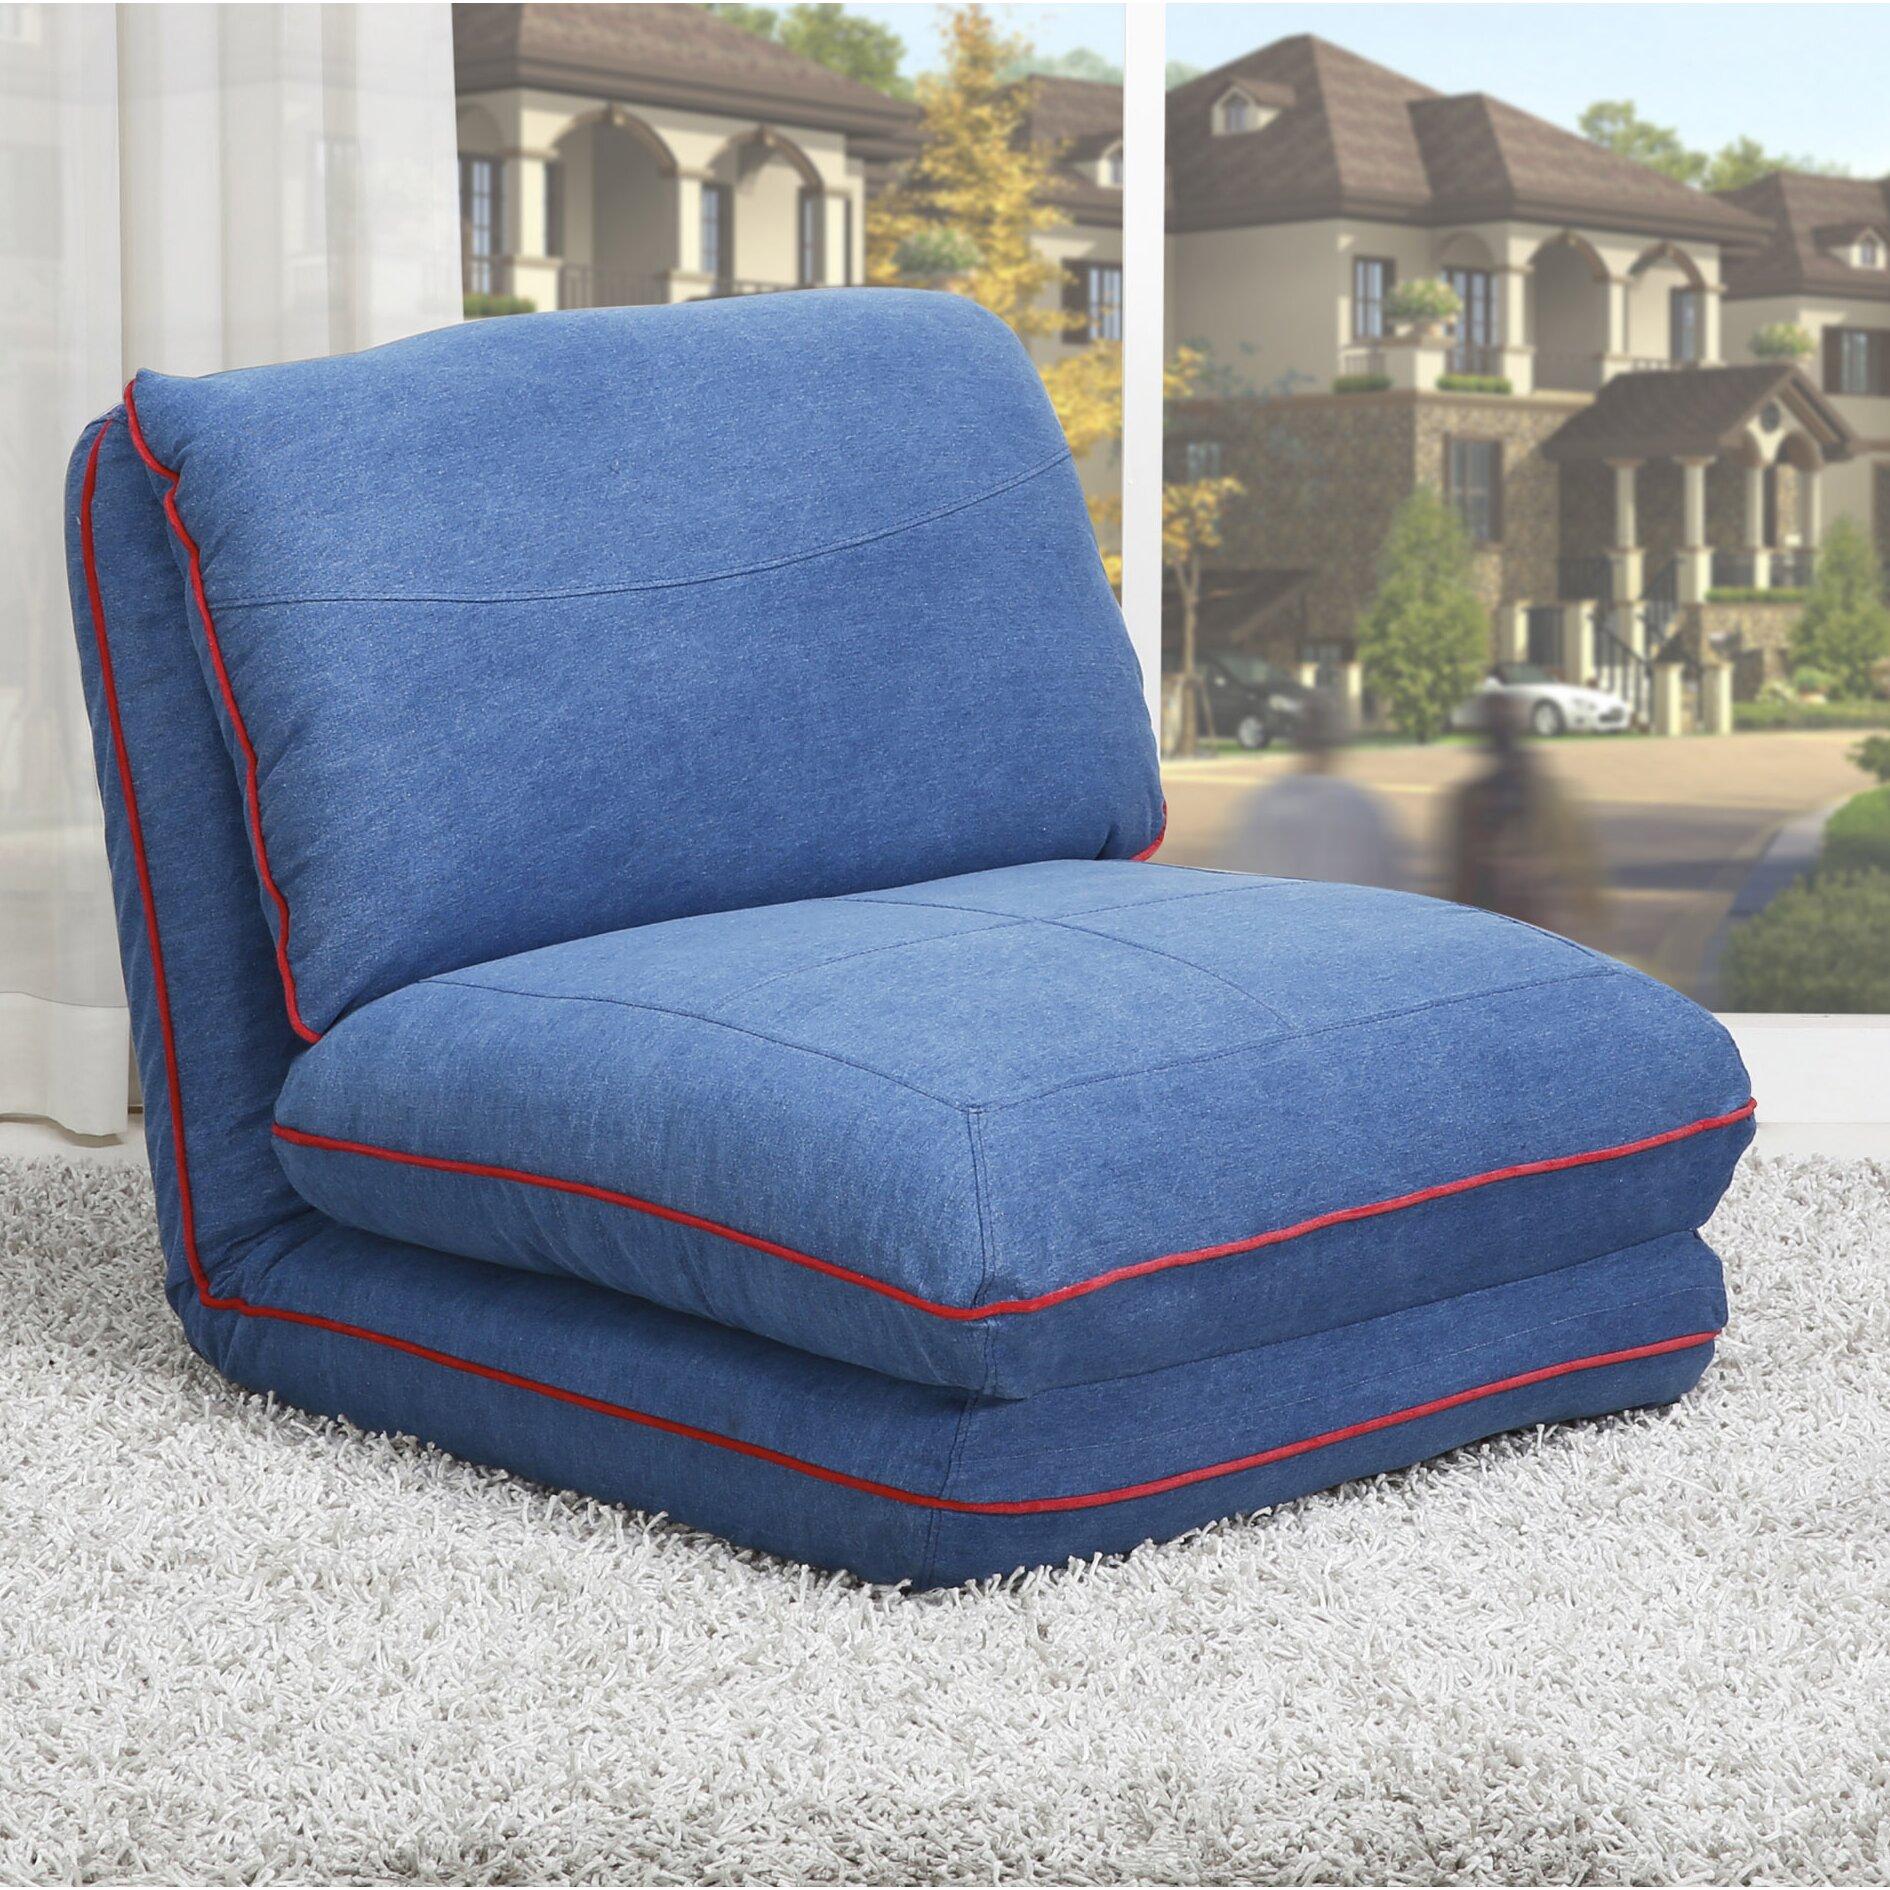 latitude run smithfield convertible chair bed reviews wayfair. Black Bedroom Furniture Sets. Home Design Ideas